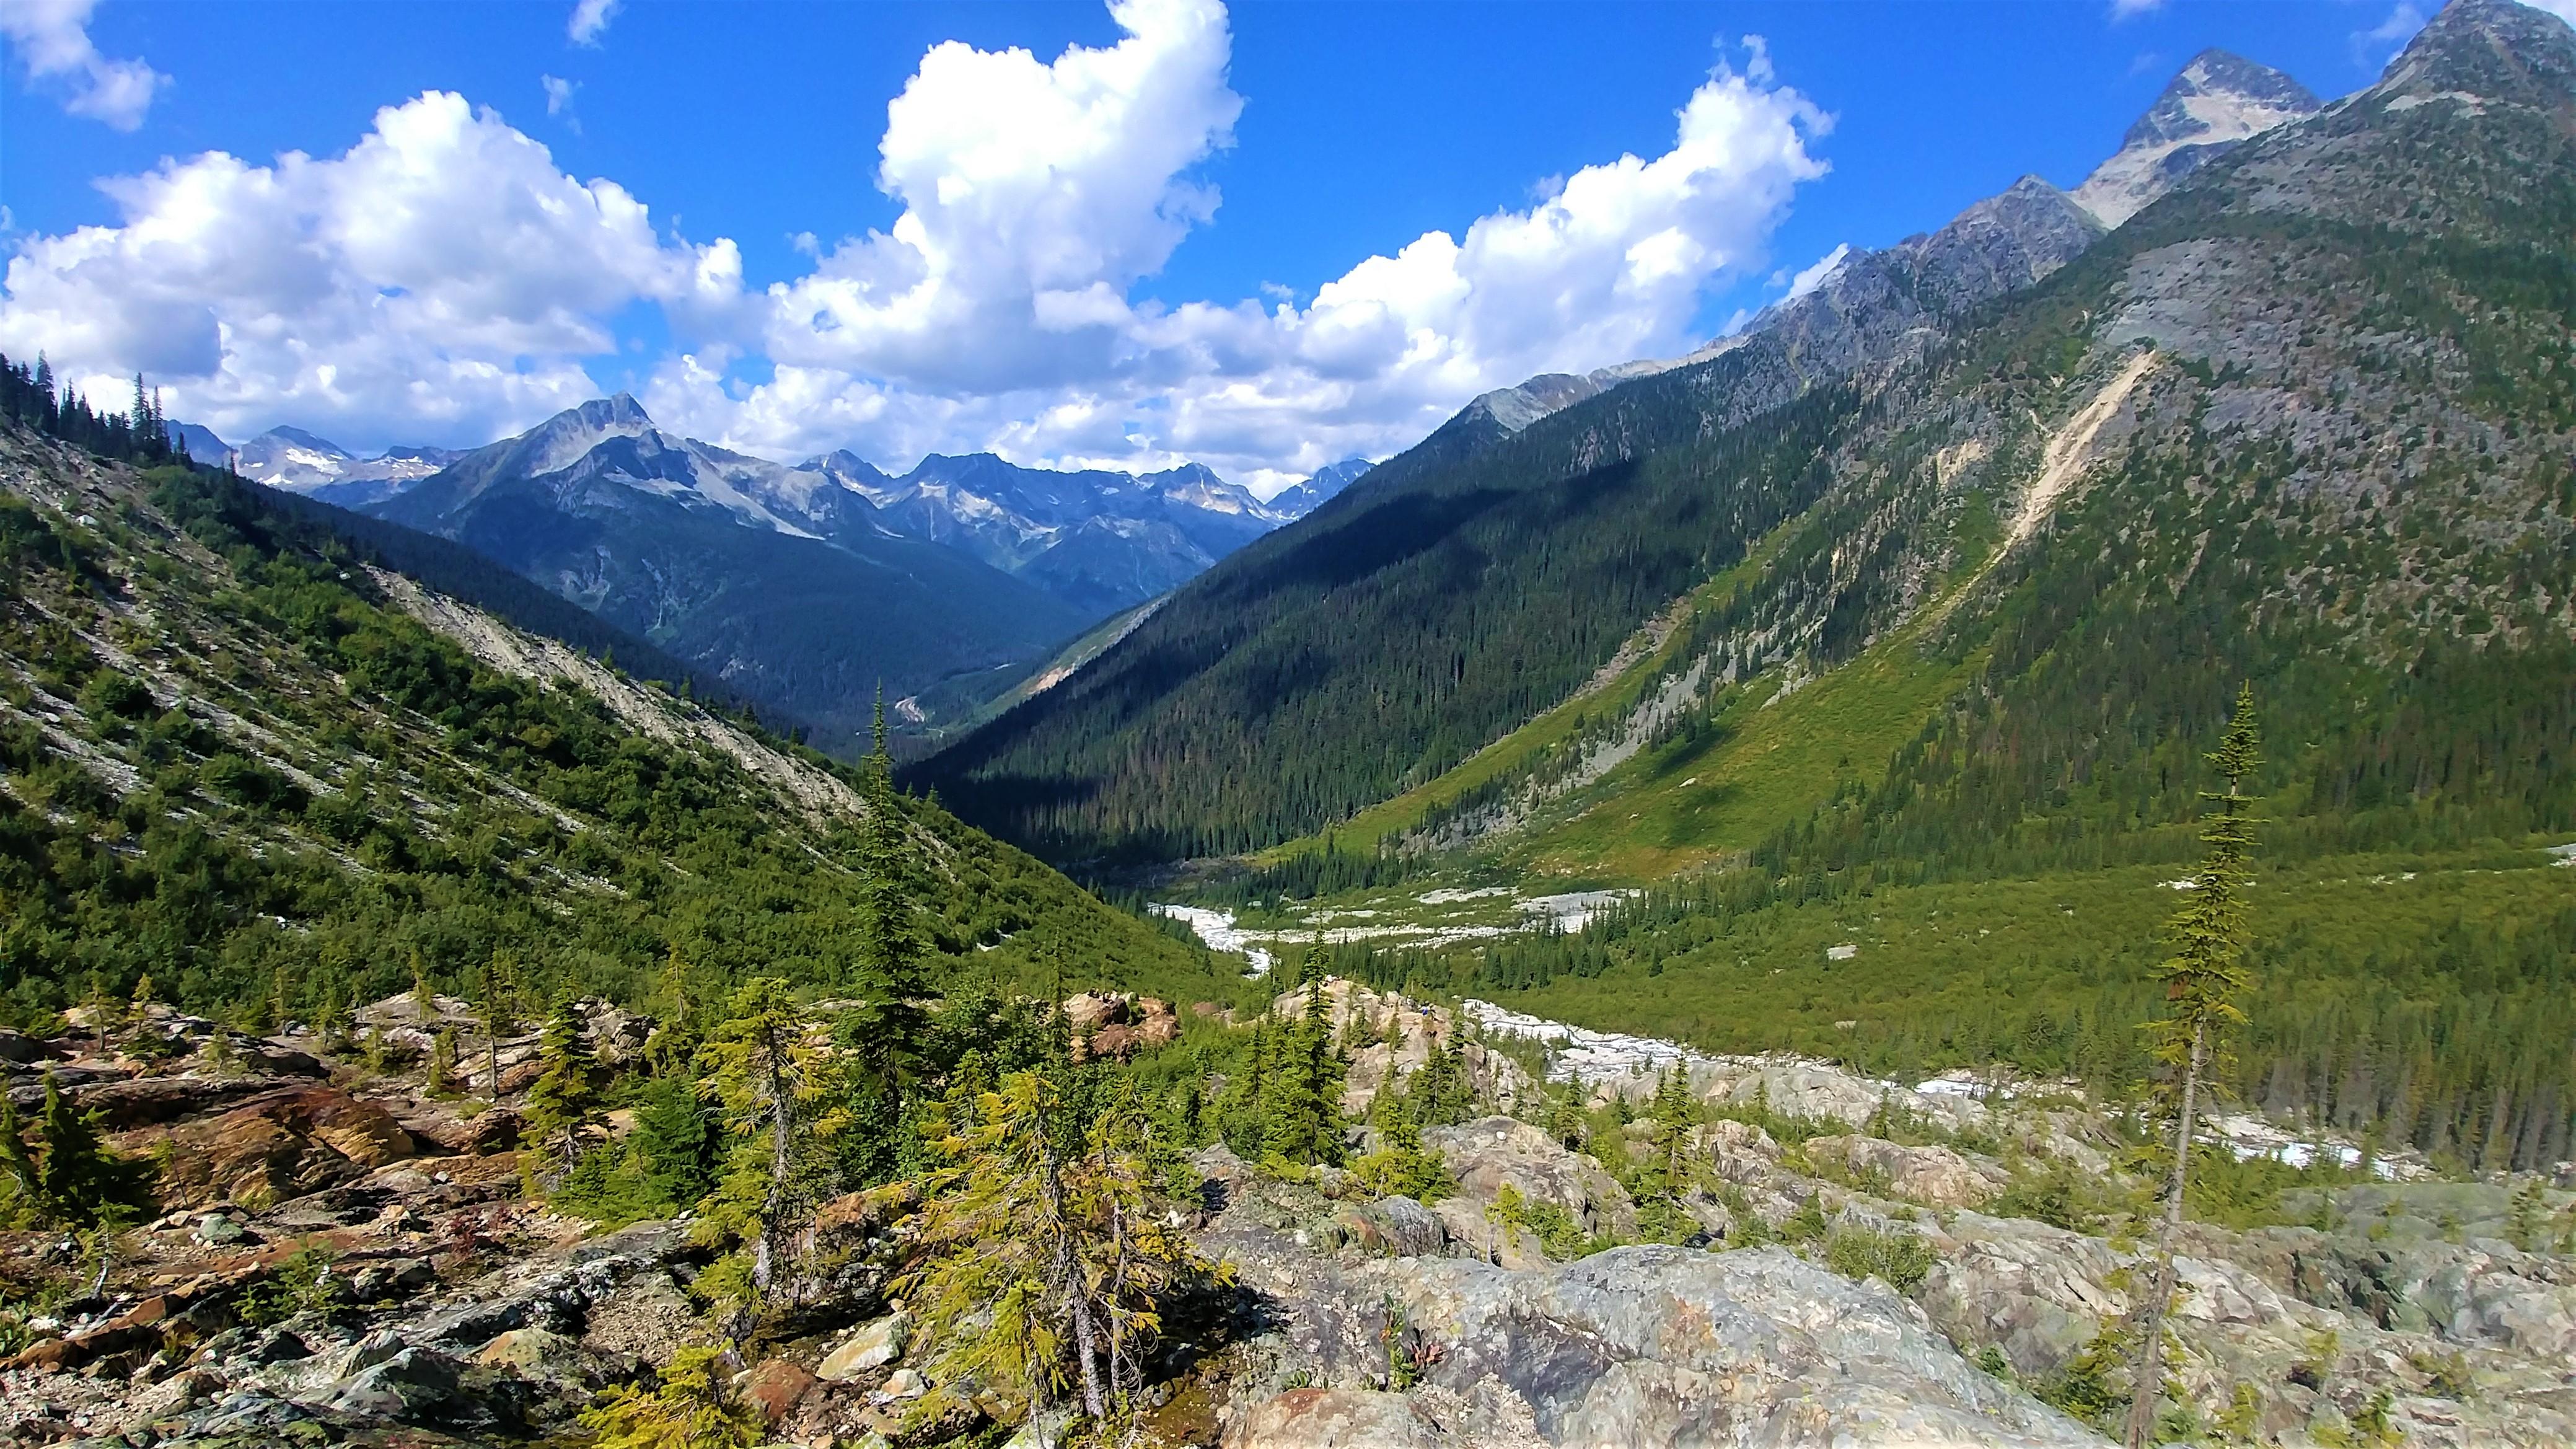 revelstoke parc national glaciers sentier grand glacier